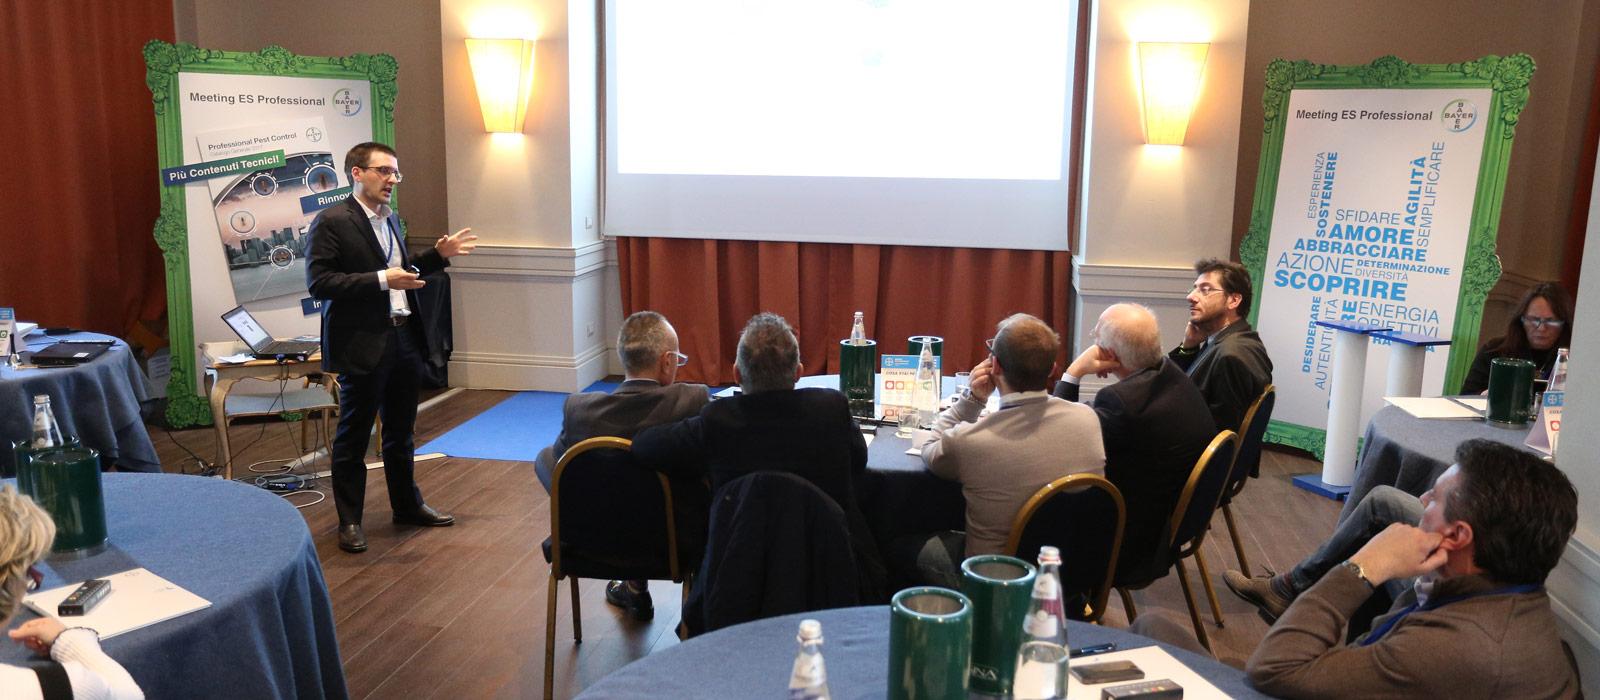 Bayer-Meeting-ES-Professional-137